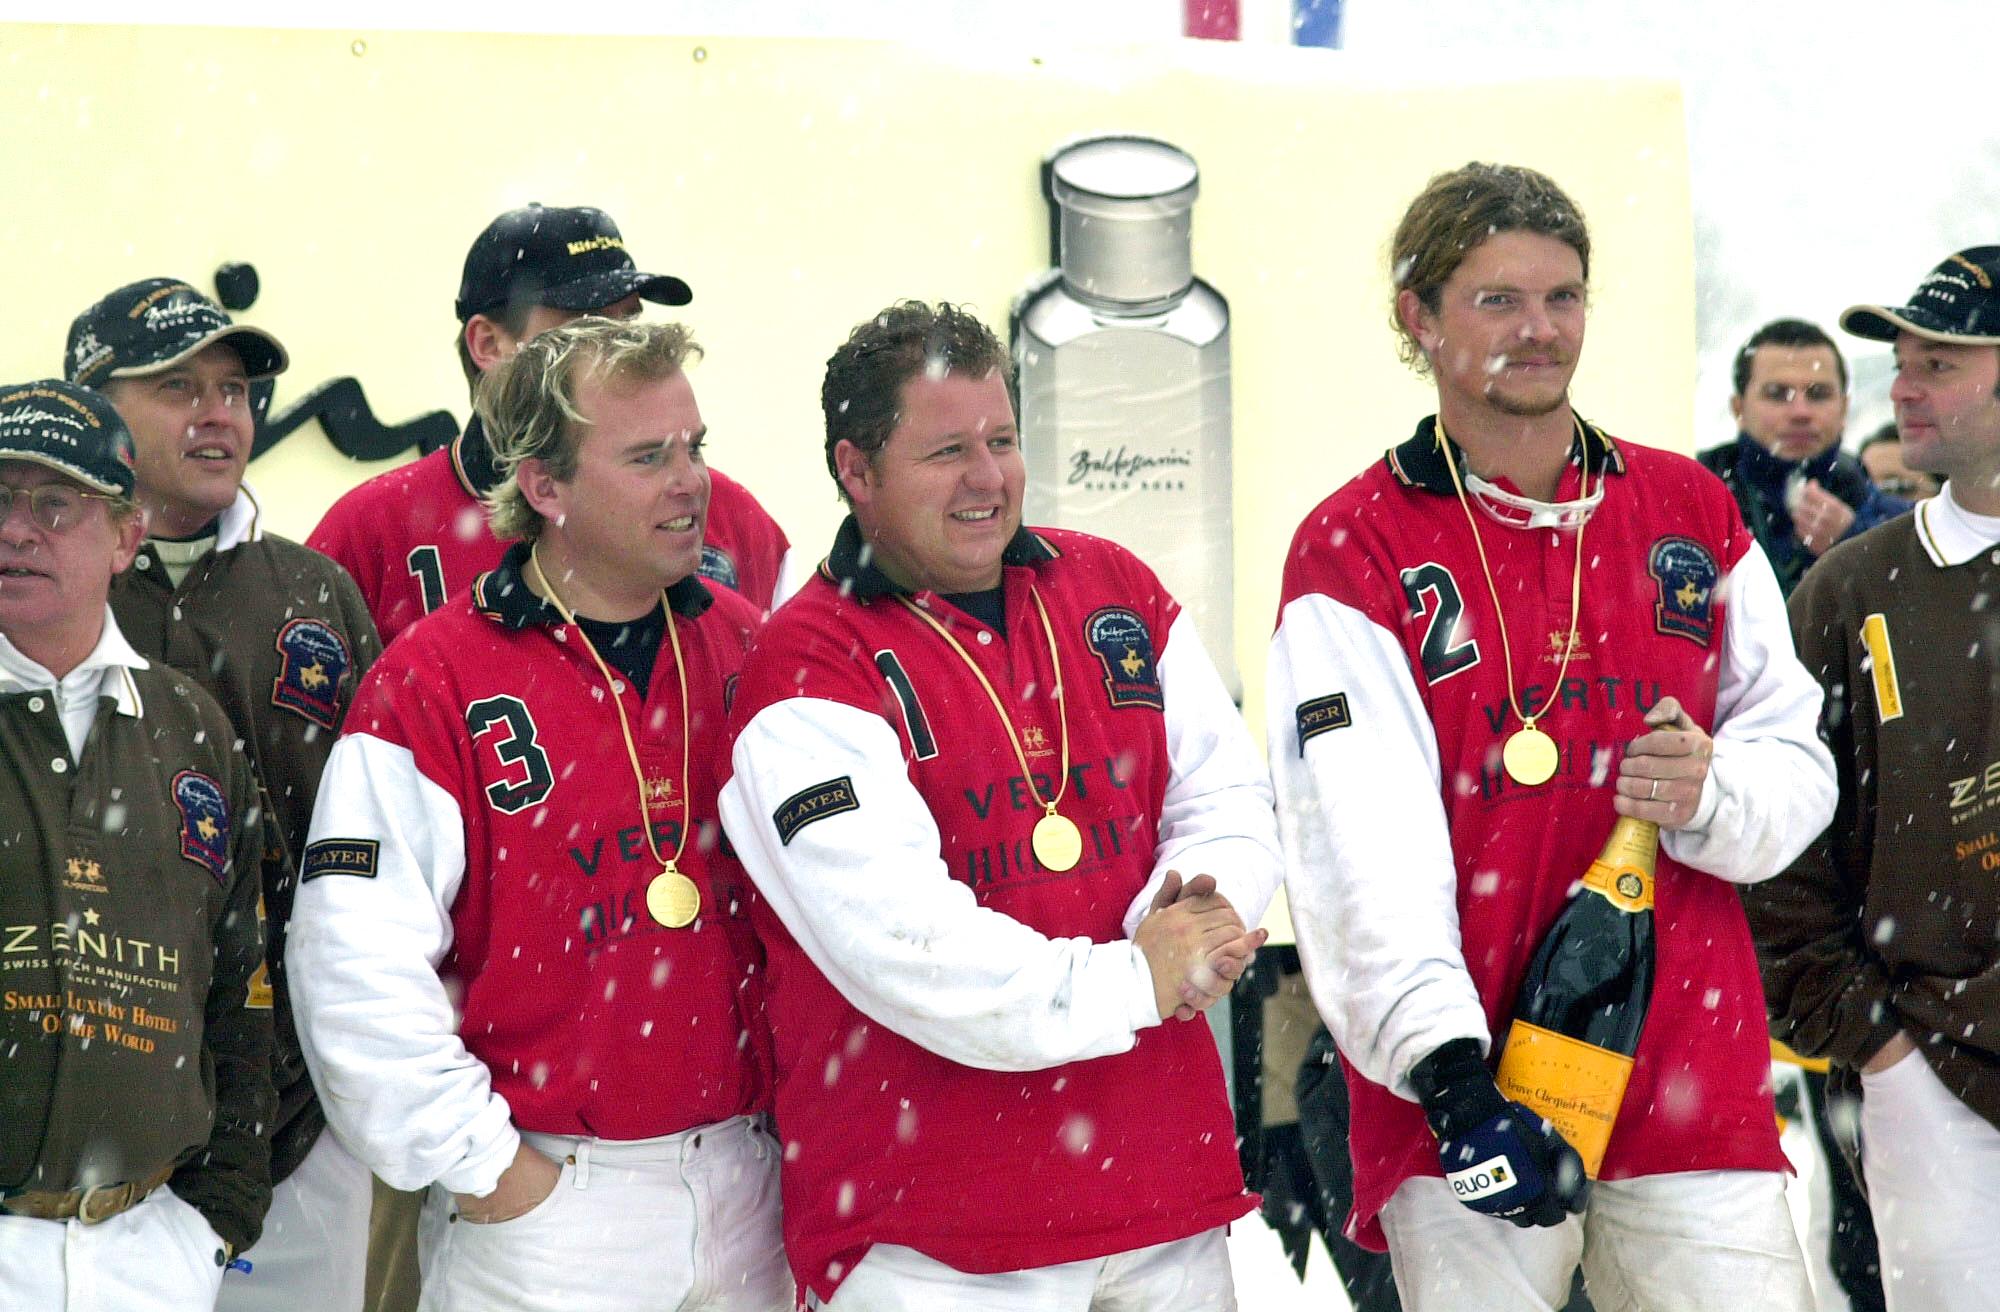 2003 Team Vertu/ High Life  - Tim Bown (ENG), Tony Pidgeley (ENG), Jack Kidd (ENG)